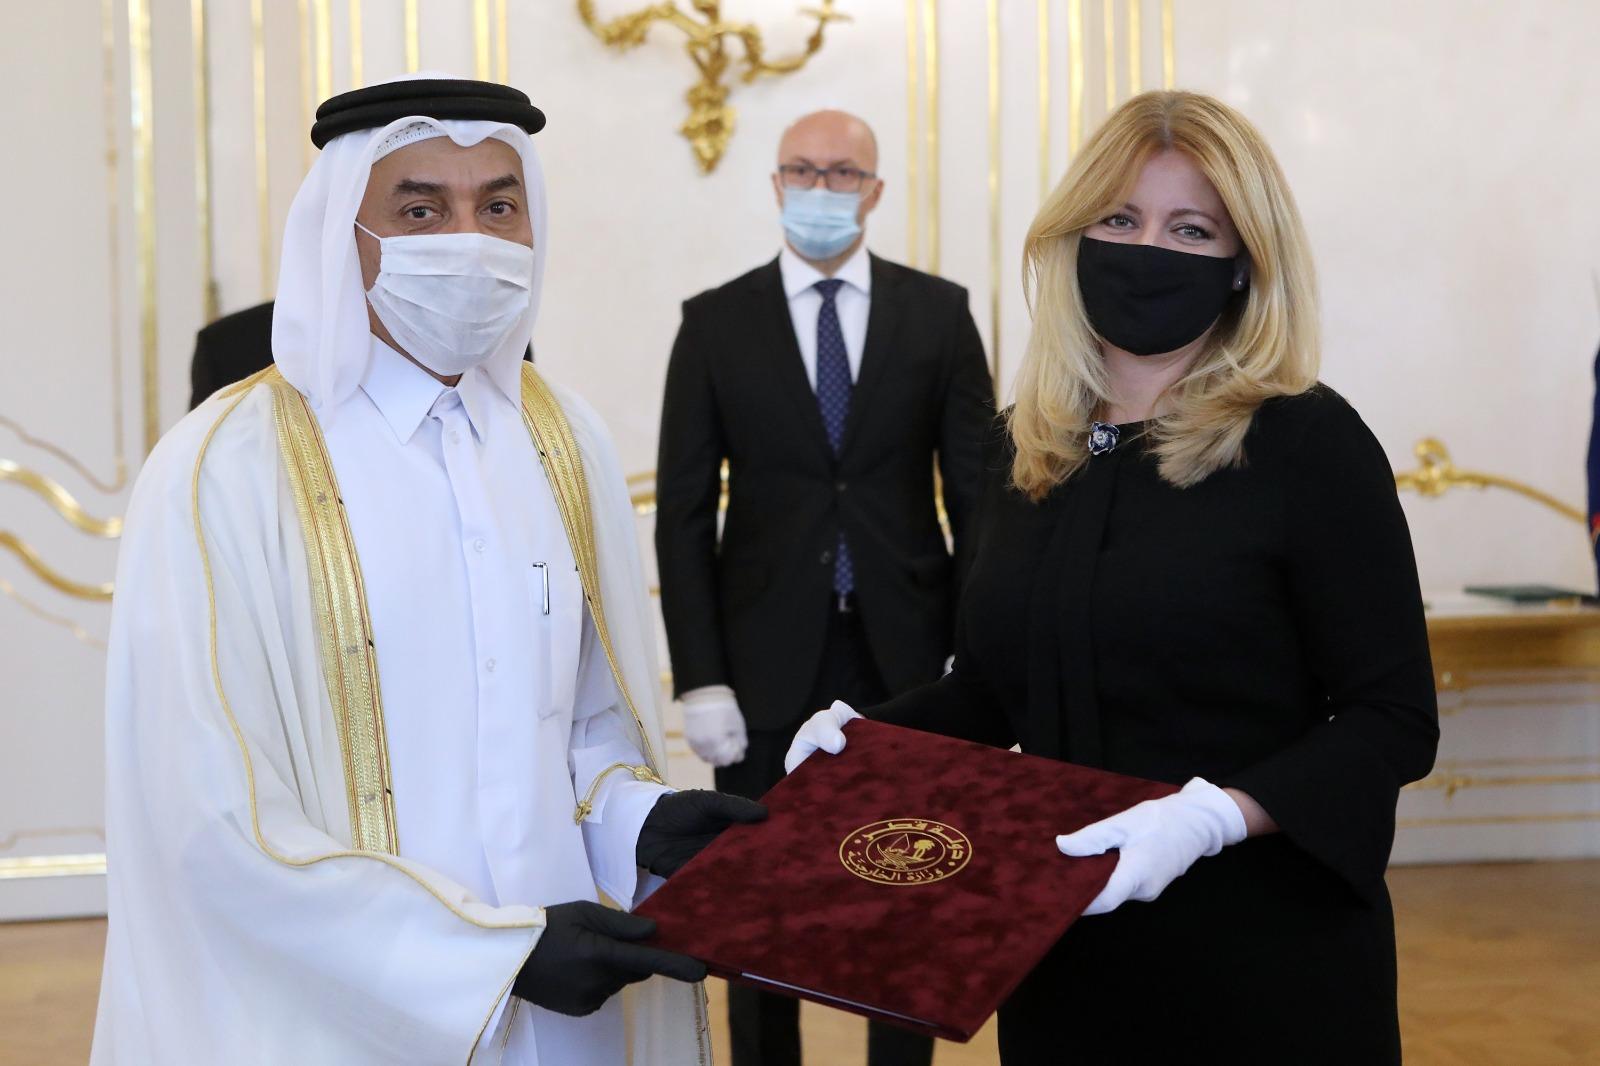 President of Slovak Republic Receives Credentials of Ambassador of Qatar